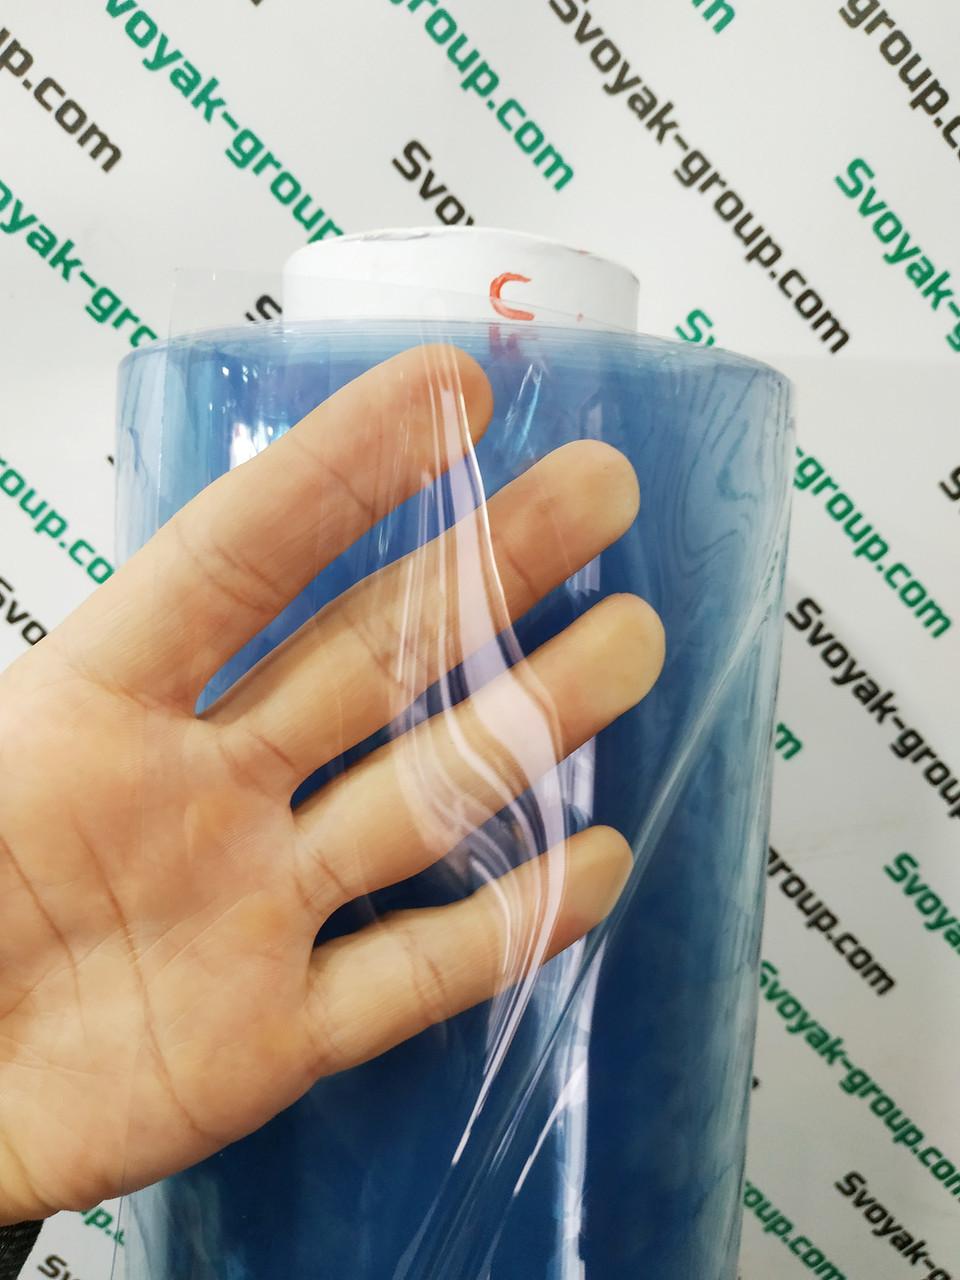 Пленка силиконовая пвх на стол 250 мкм (0,25 мм) - ширина 1,5 м.Мягкое стекло.Прозрачная.